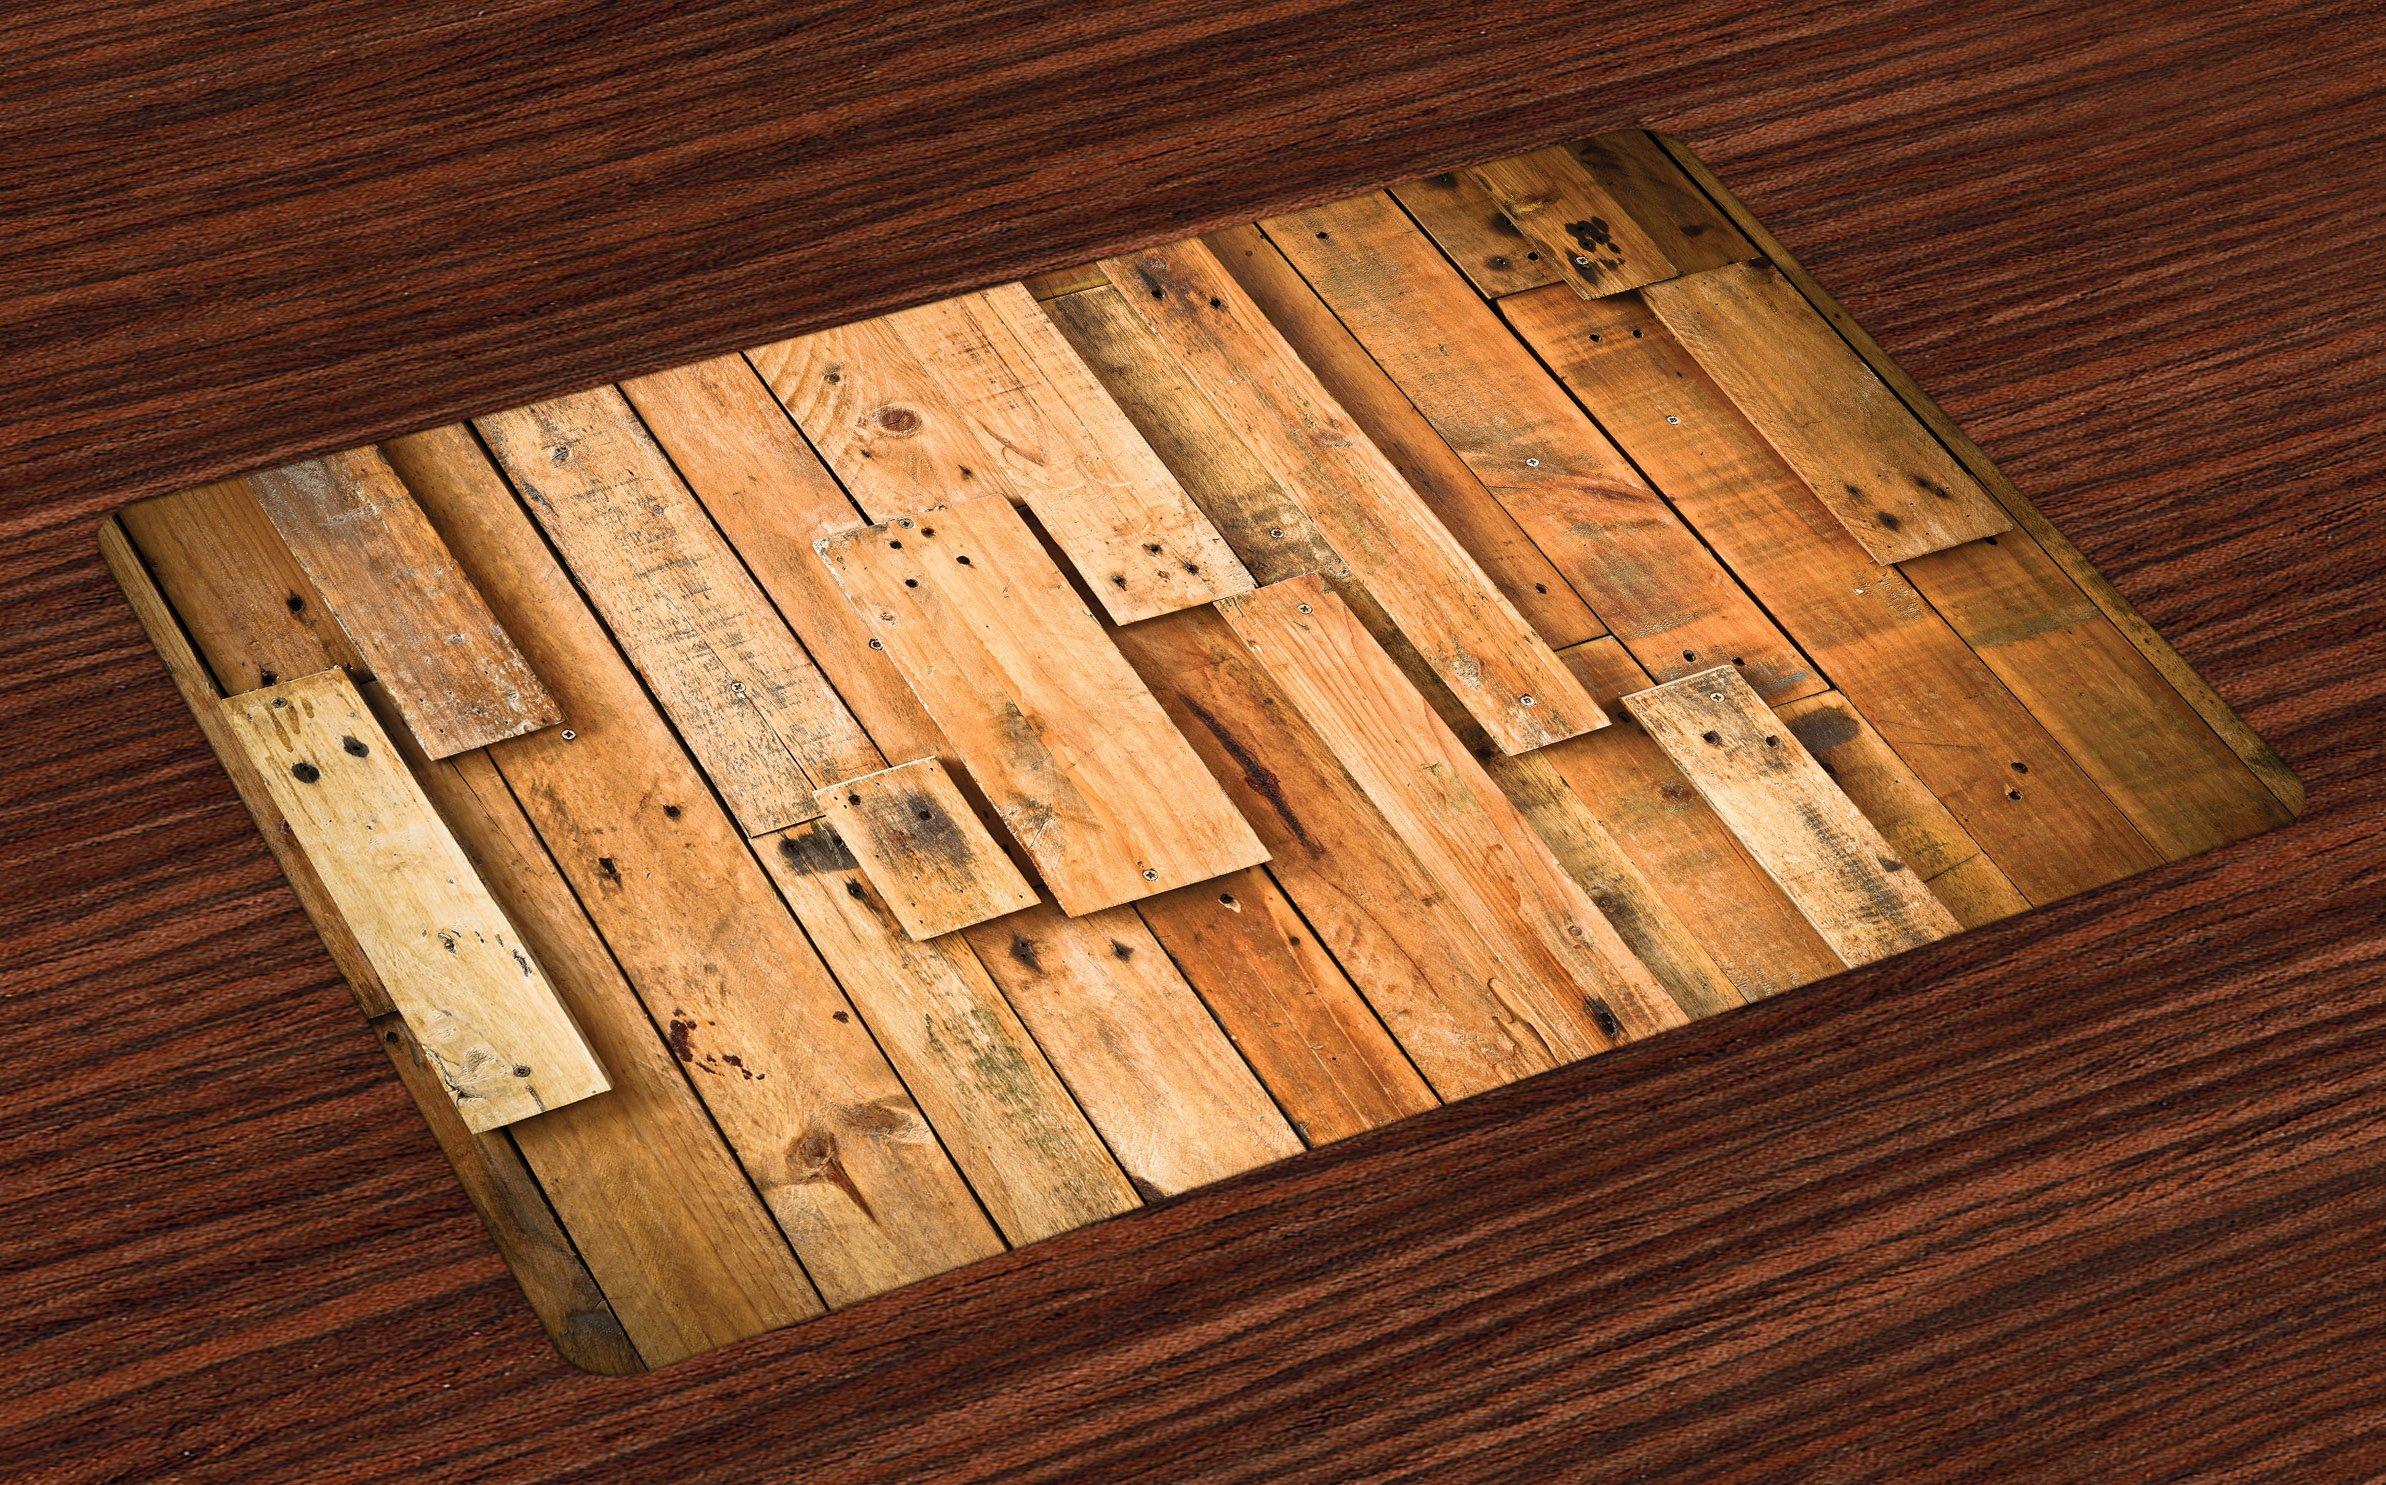 Ambesonne Wooden Place Mats Set of 4, Lodge Style Hardwood Planks Image Print Farmhouse Grunge Design, Washable Fabric Placemats for Dining Room Kitchen Table Decor, Salmon Orange Burnt Orange